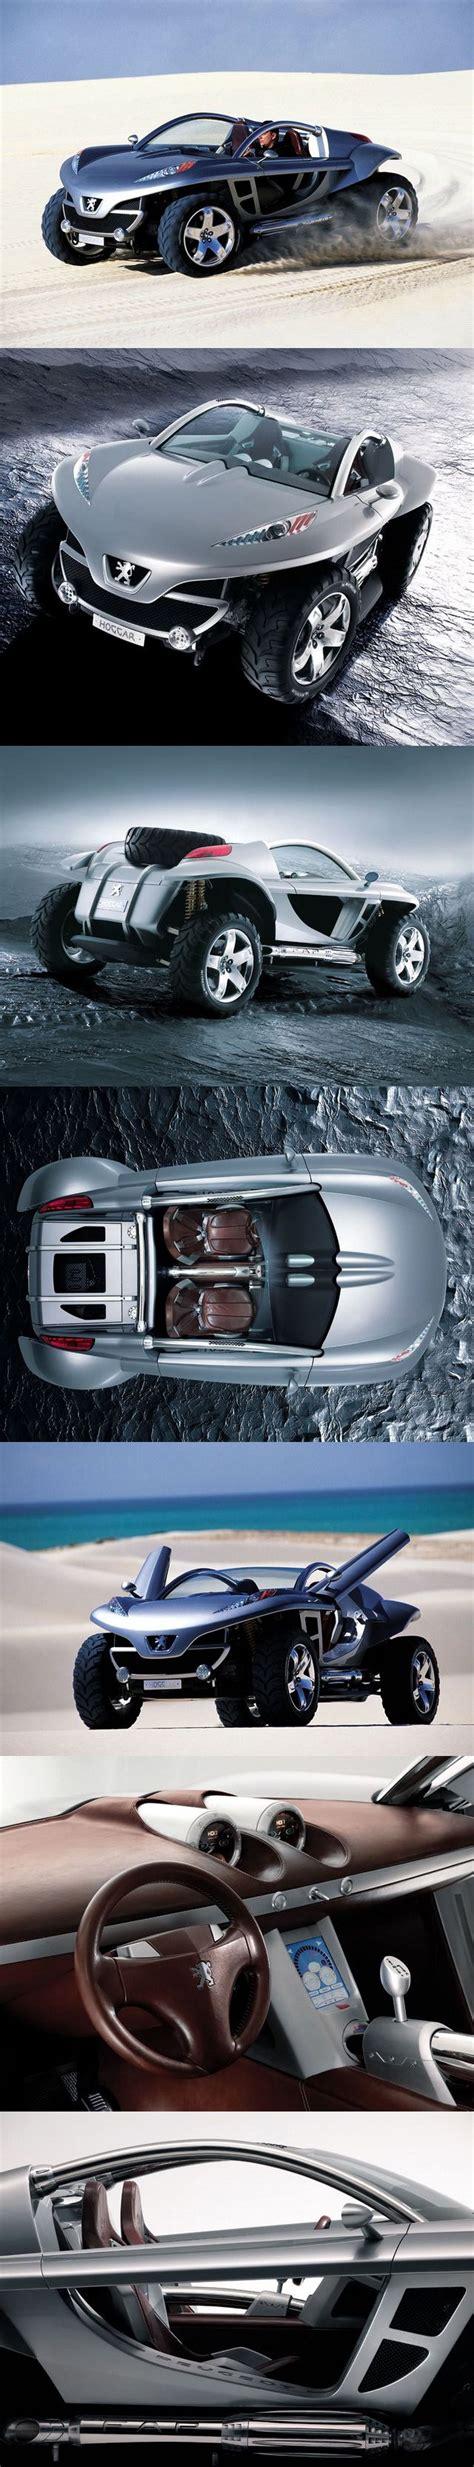 luxury peugeot cars 17 best images about concept car on pinterest